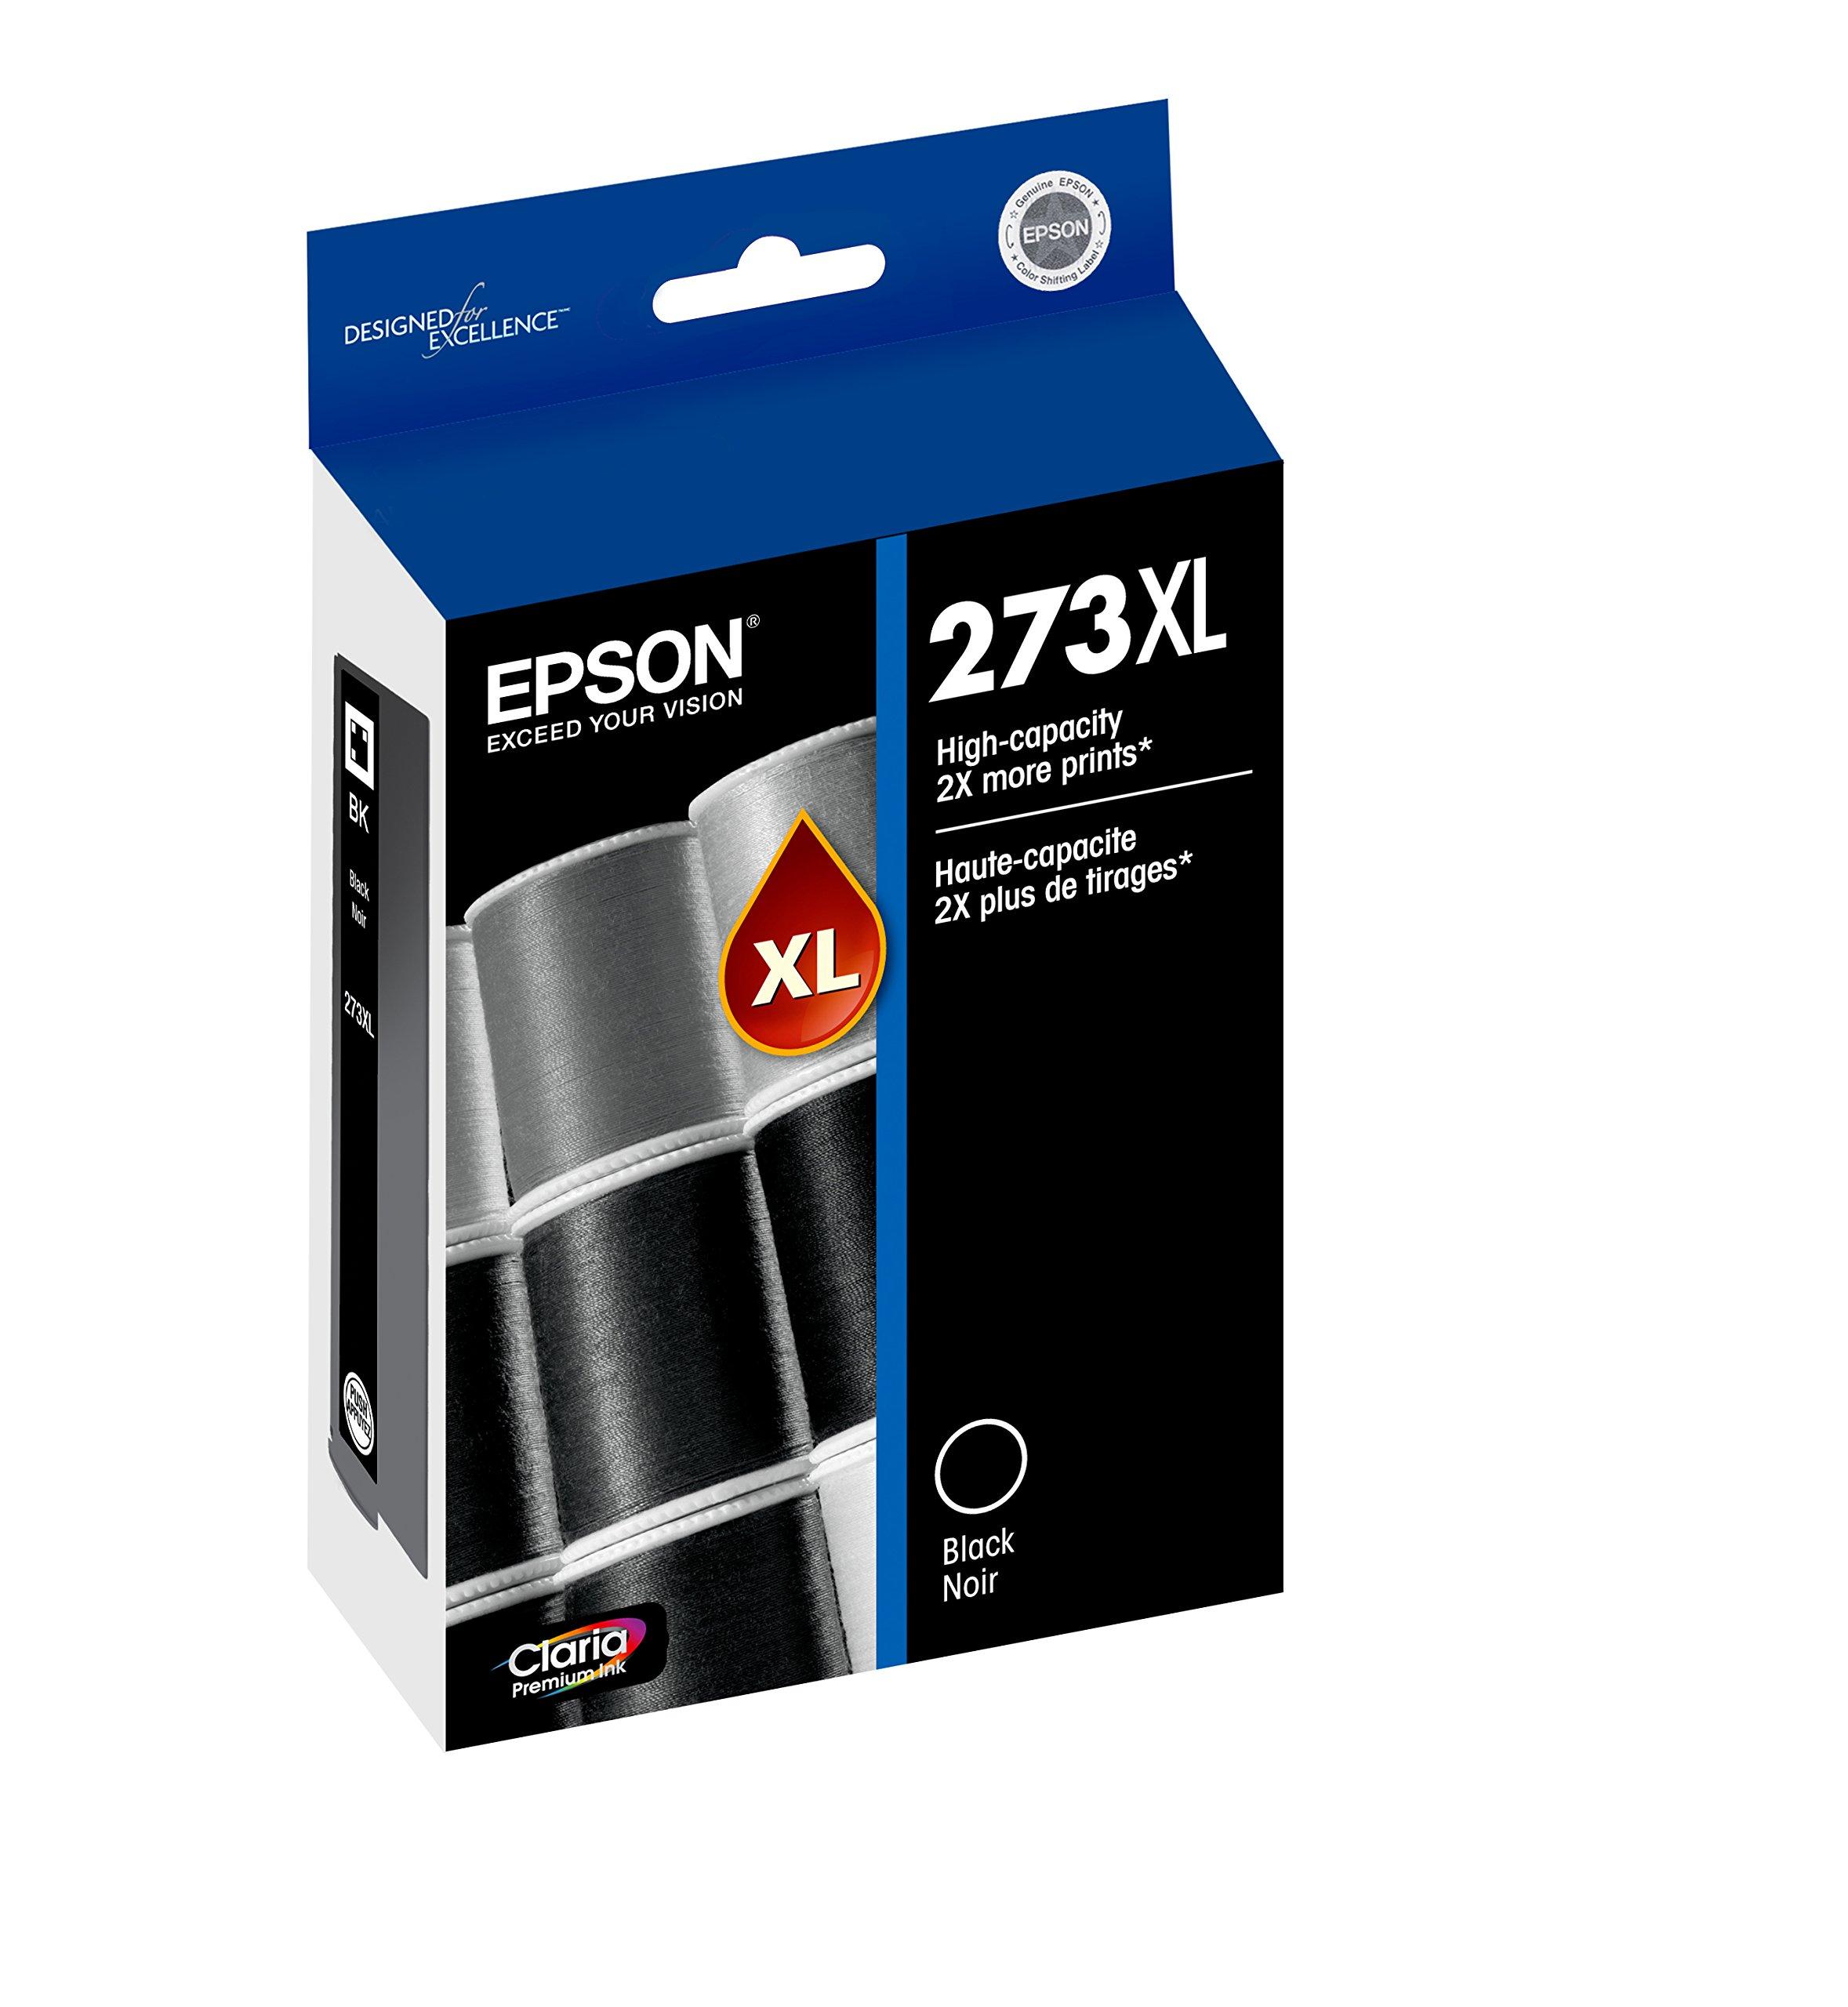 Epson T273XL020 Claria Premium High Capacity Cartridge Ink Black by Epson (Image #1)